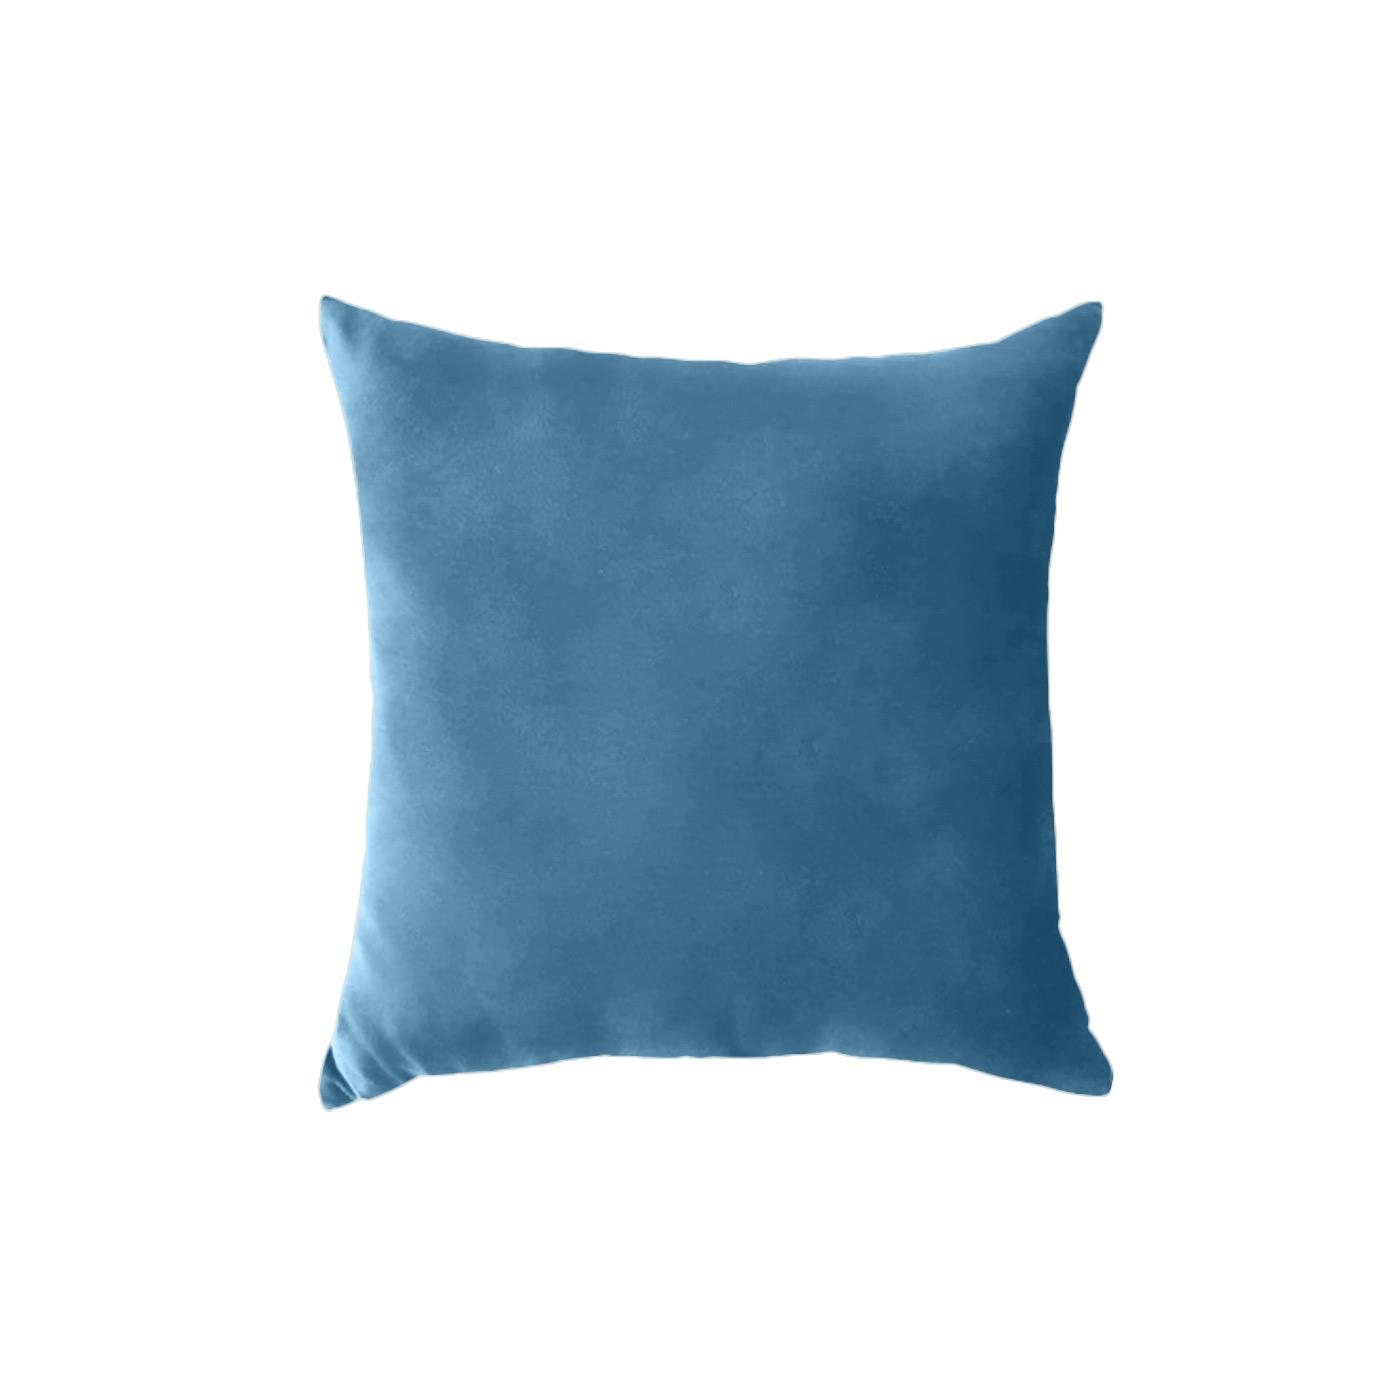 Elliot Light Blue Cushion